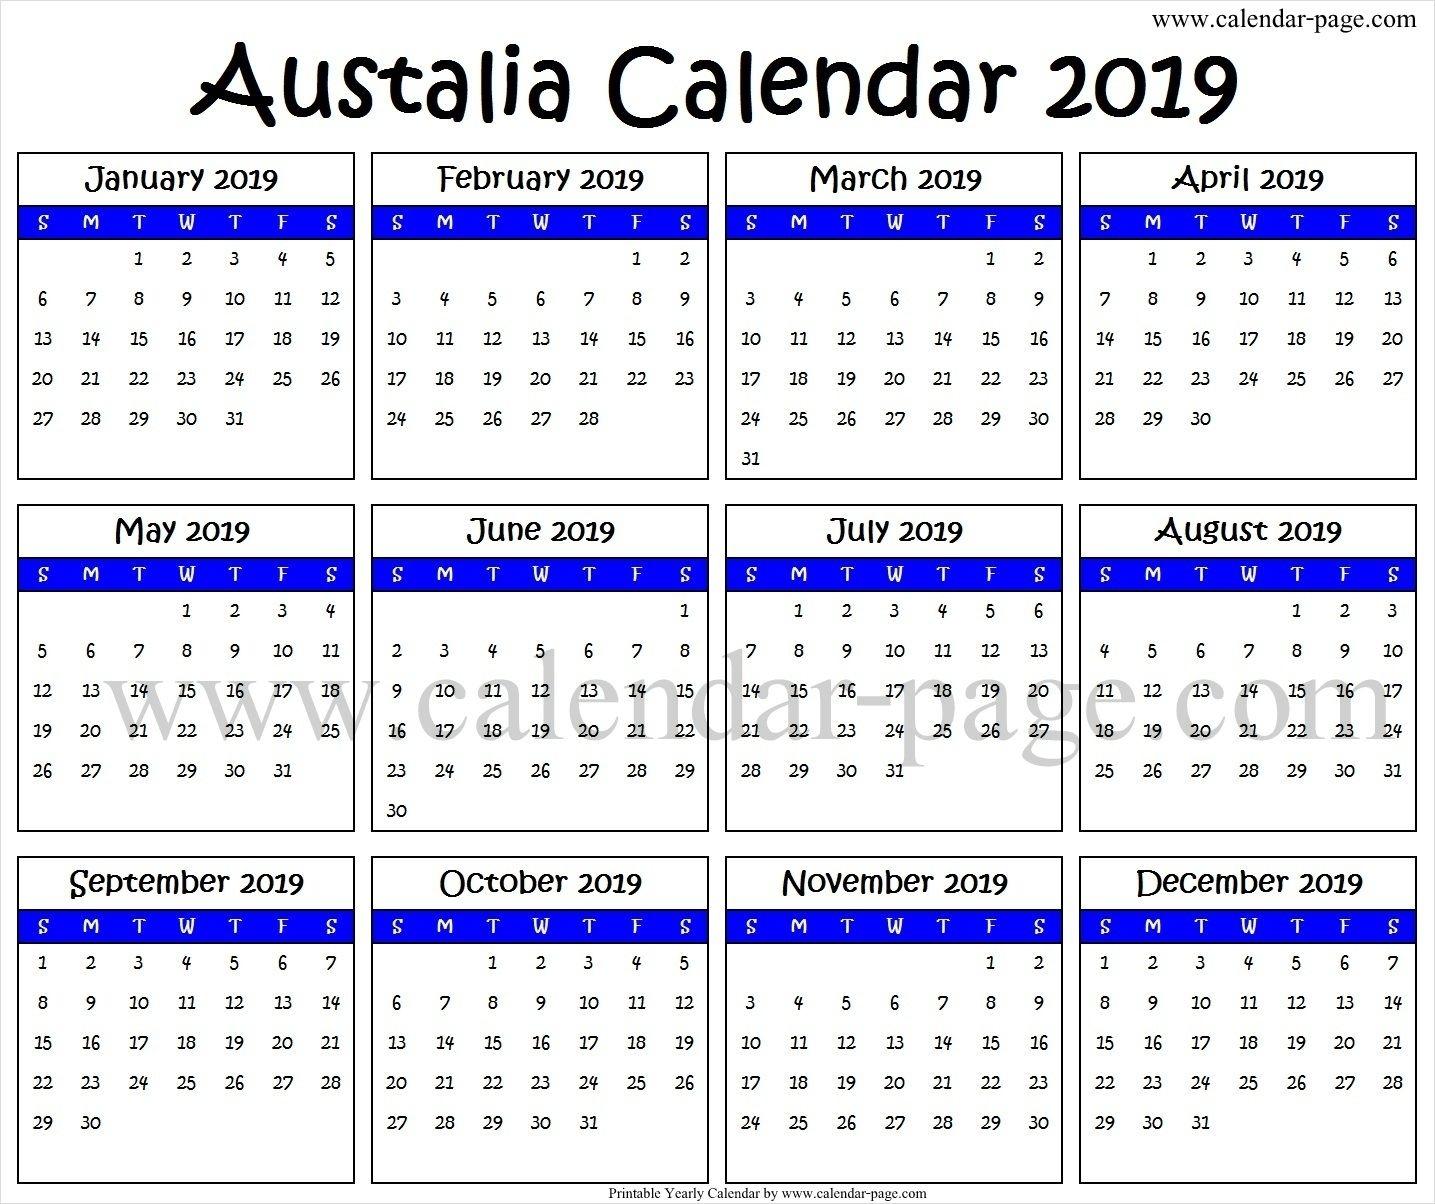 2019 South Australian Calendar - Australia Moment intended for Split Calendar 2019 2020 South Australia